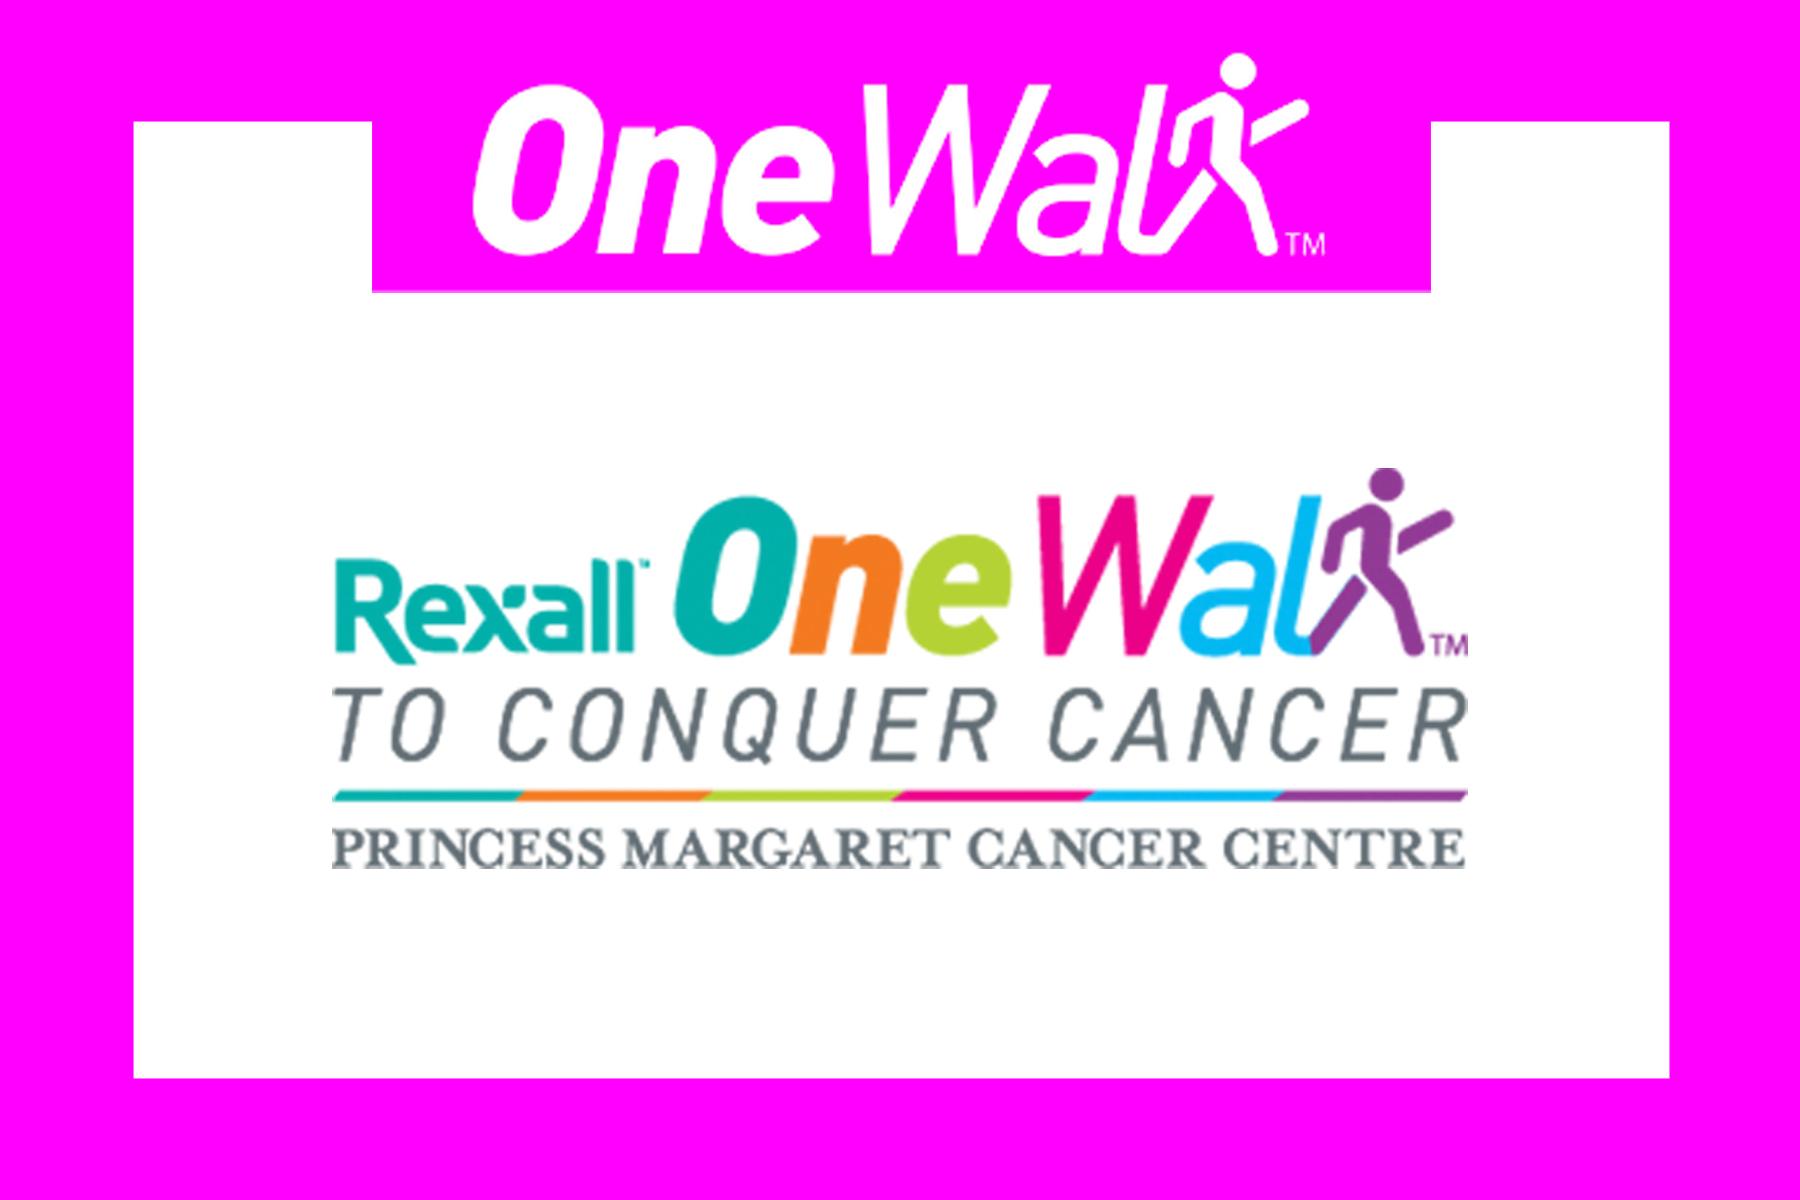 onewalk_logo.jpg